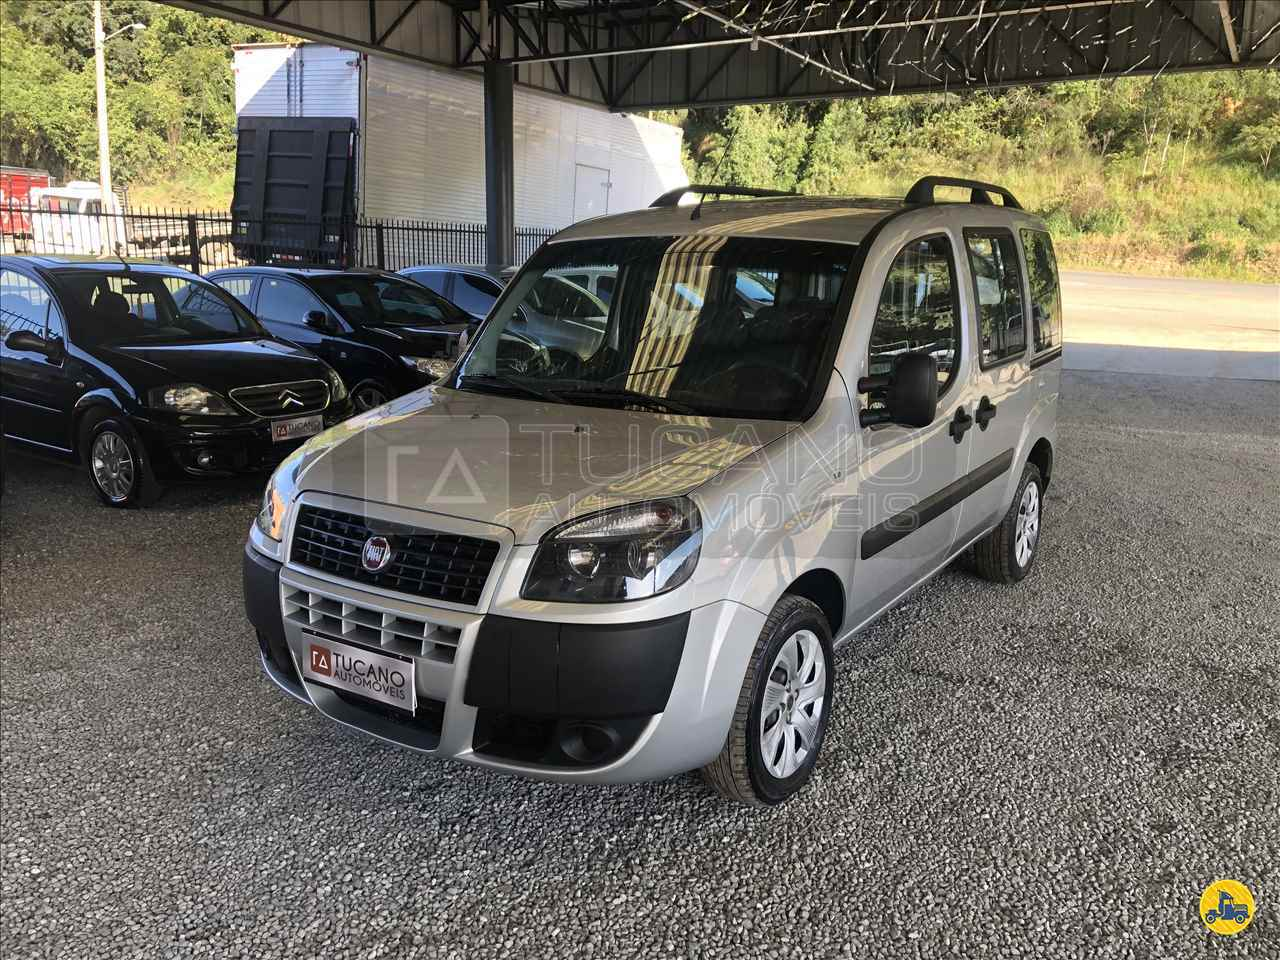 CARRO FIAT Doblo Essence 1.8 Tucano Automóveis ALFREDO WAGNER SANTA CATARINA SC